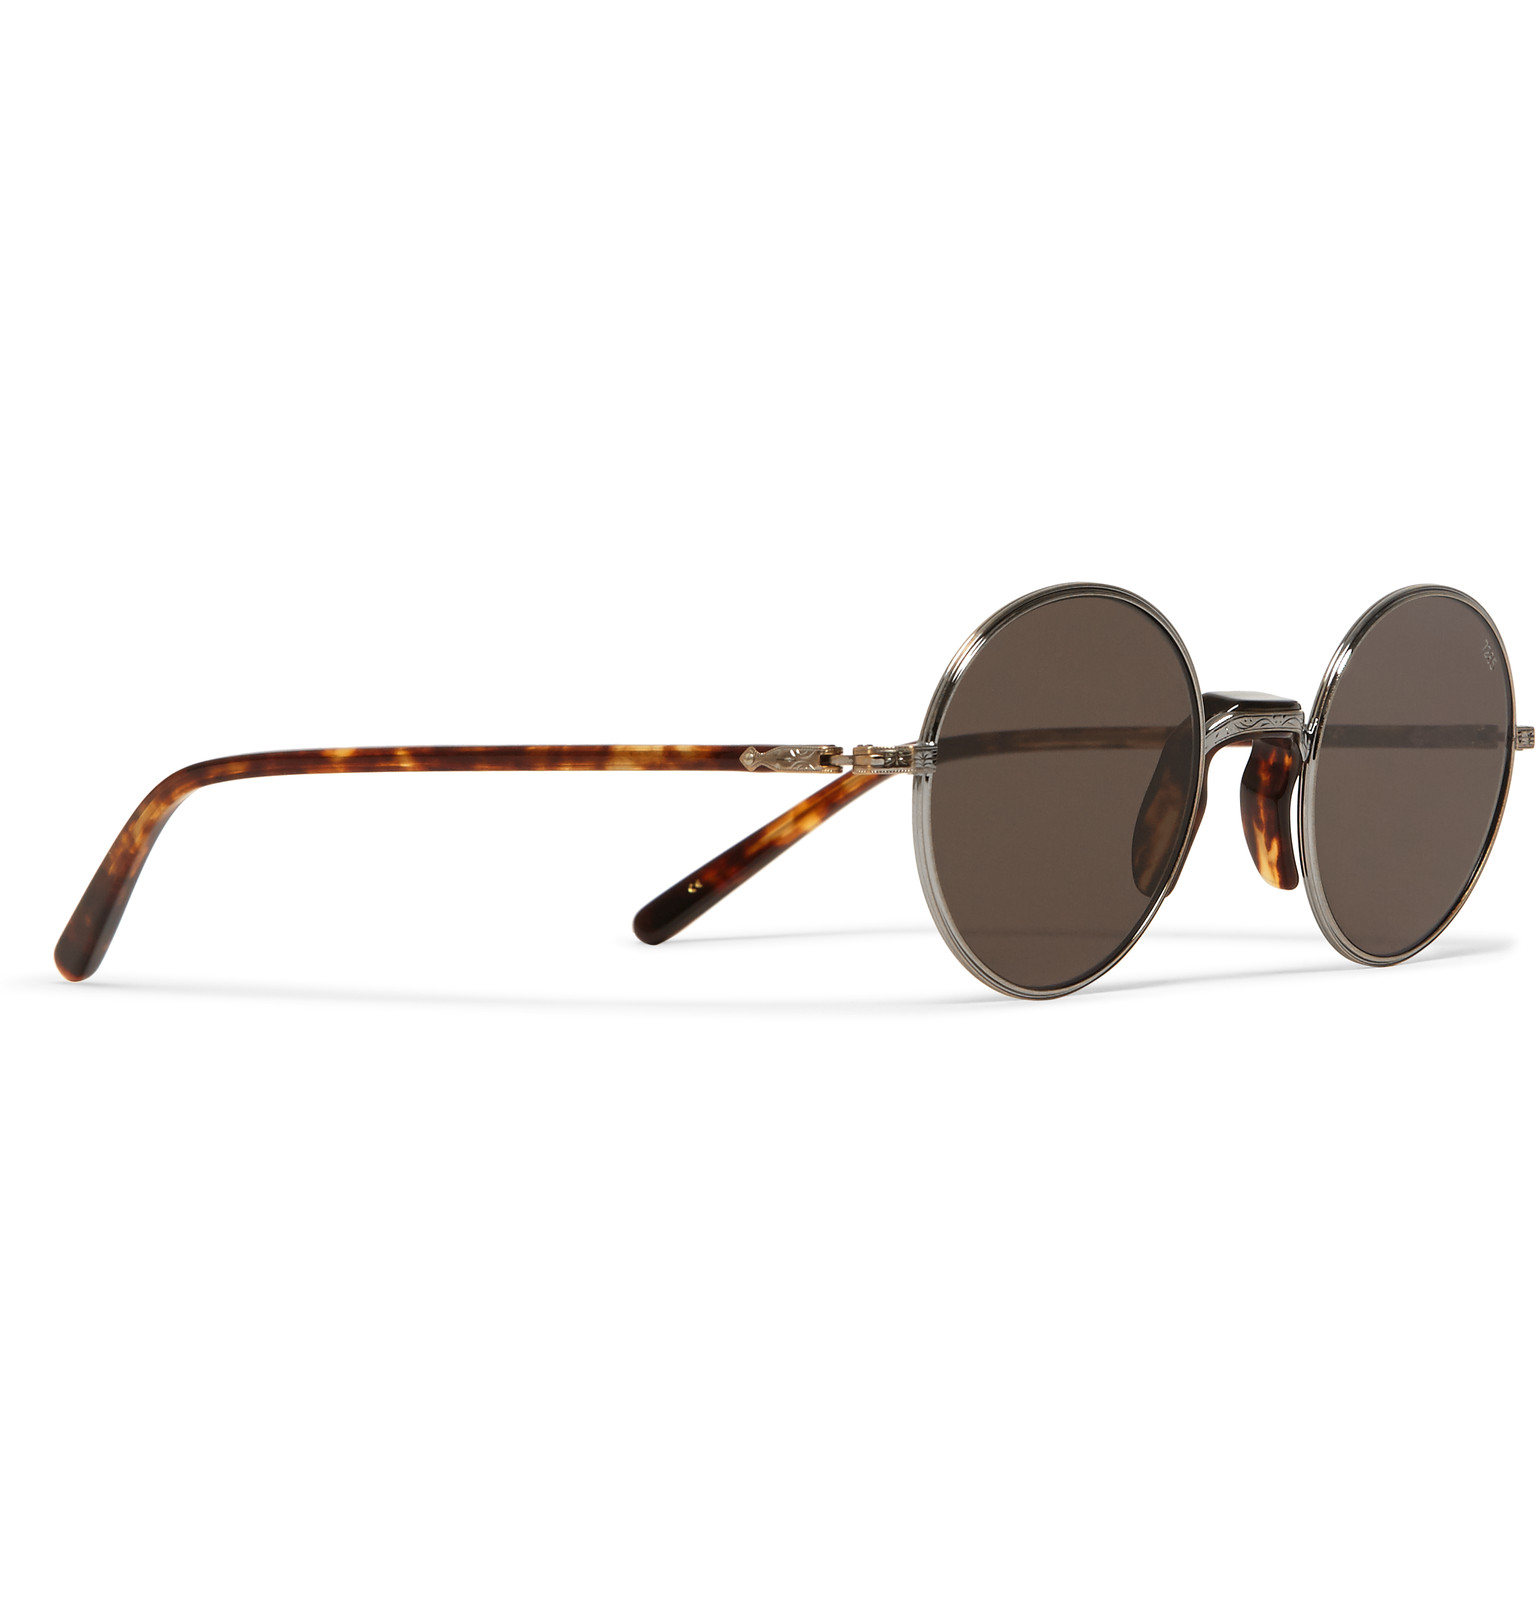 Aviator sunglasses 2019